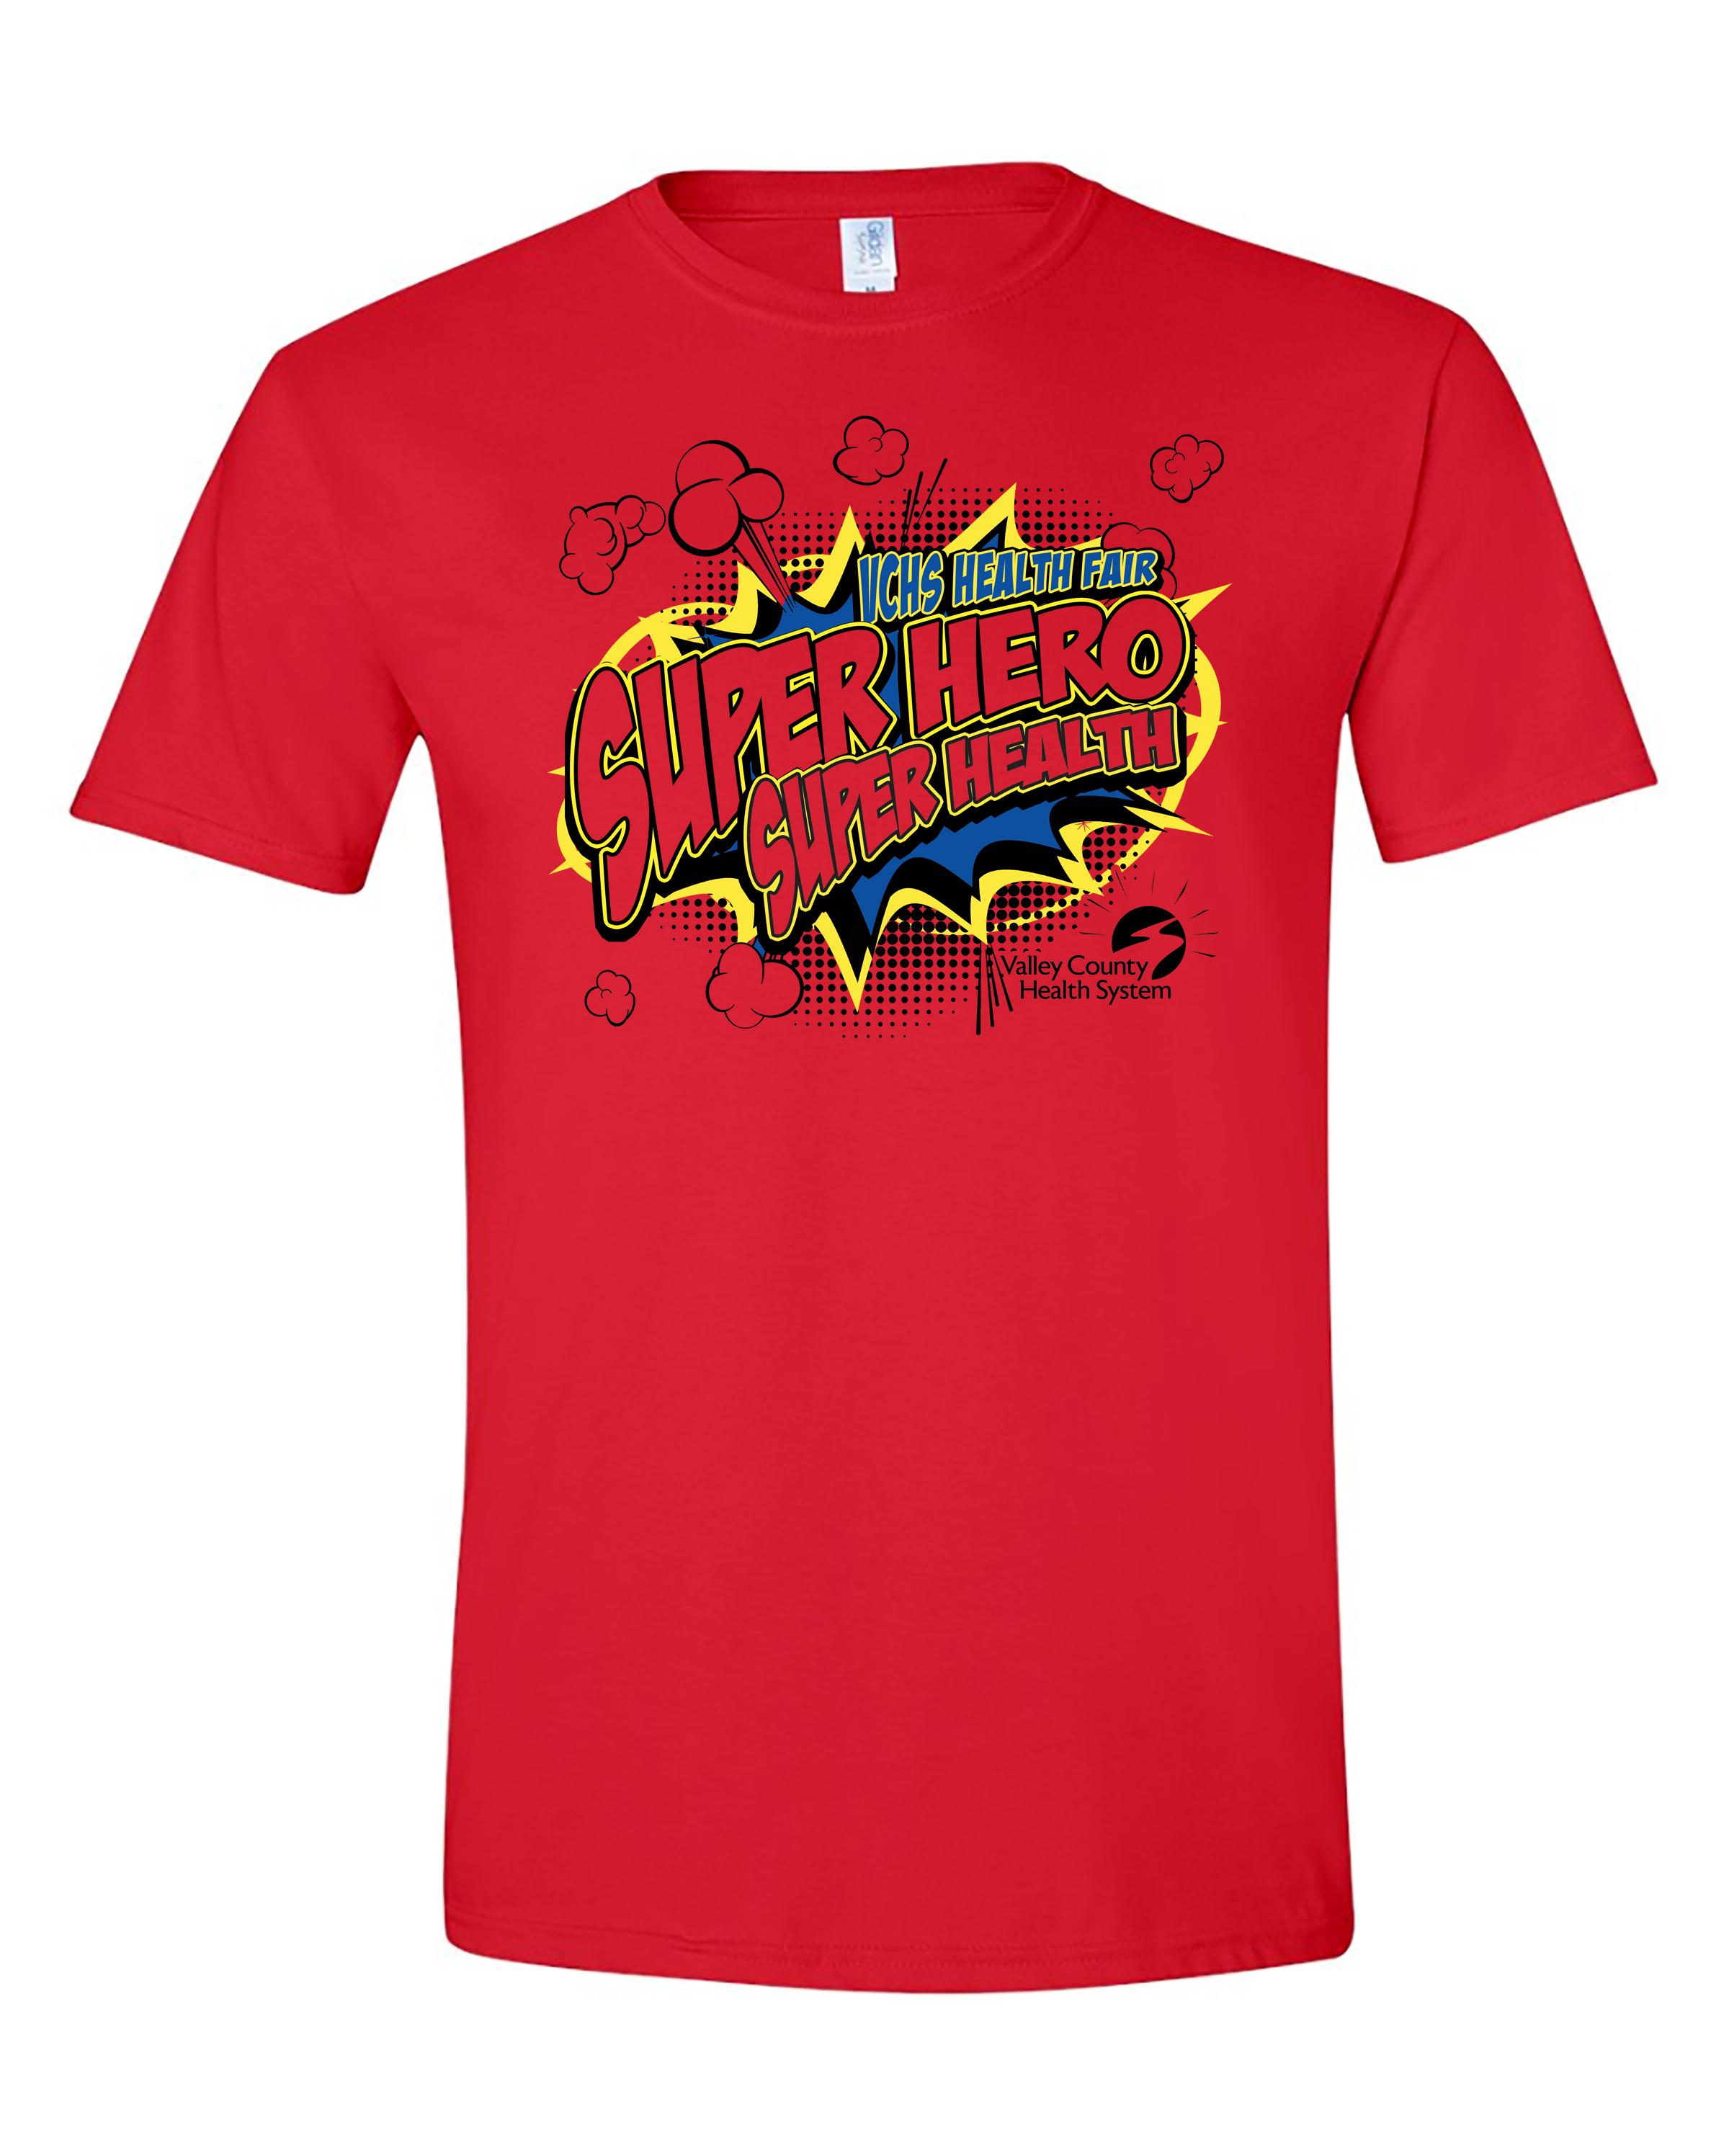 VCHS Health Fair 2 on shirt